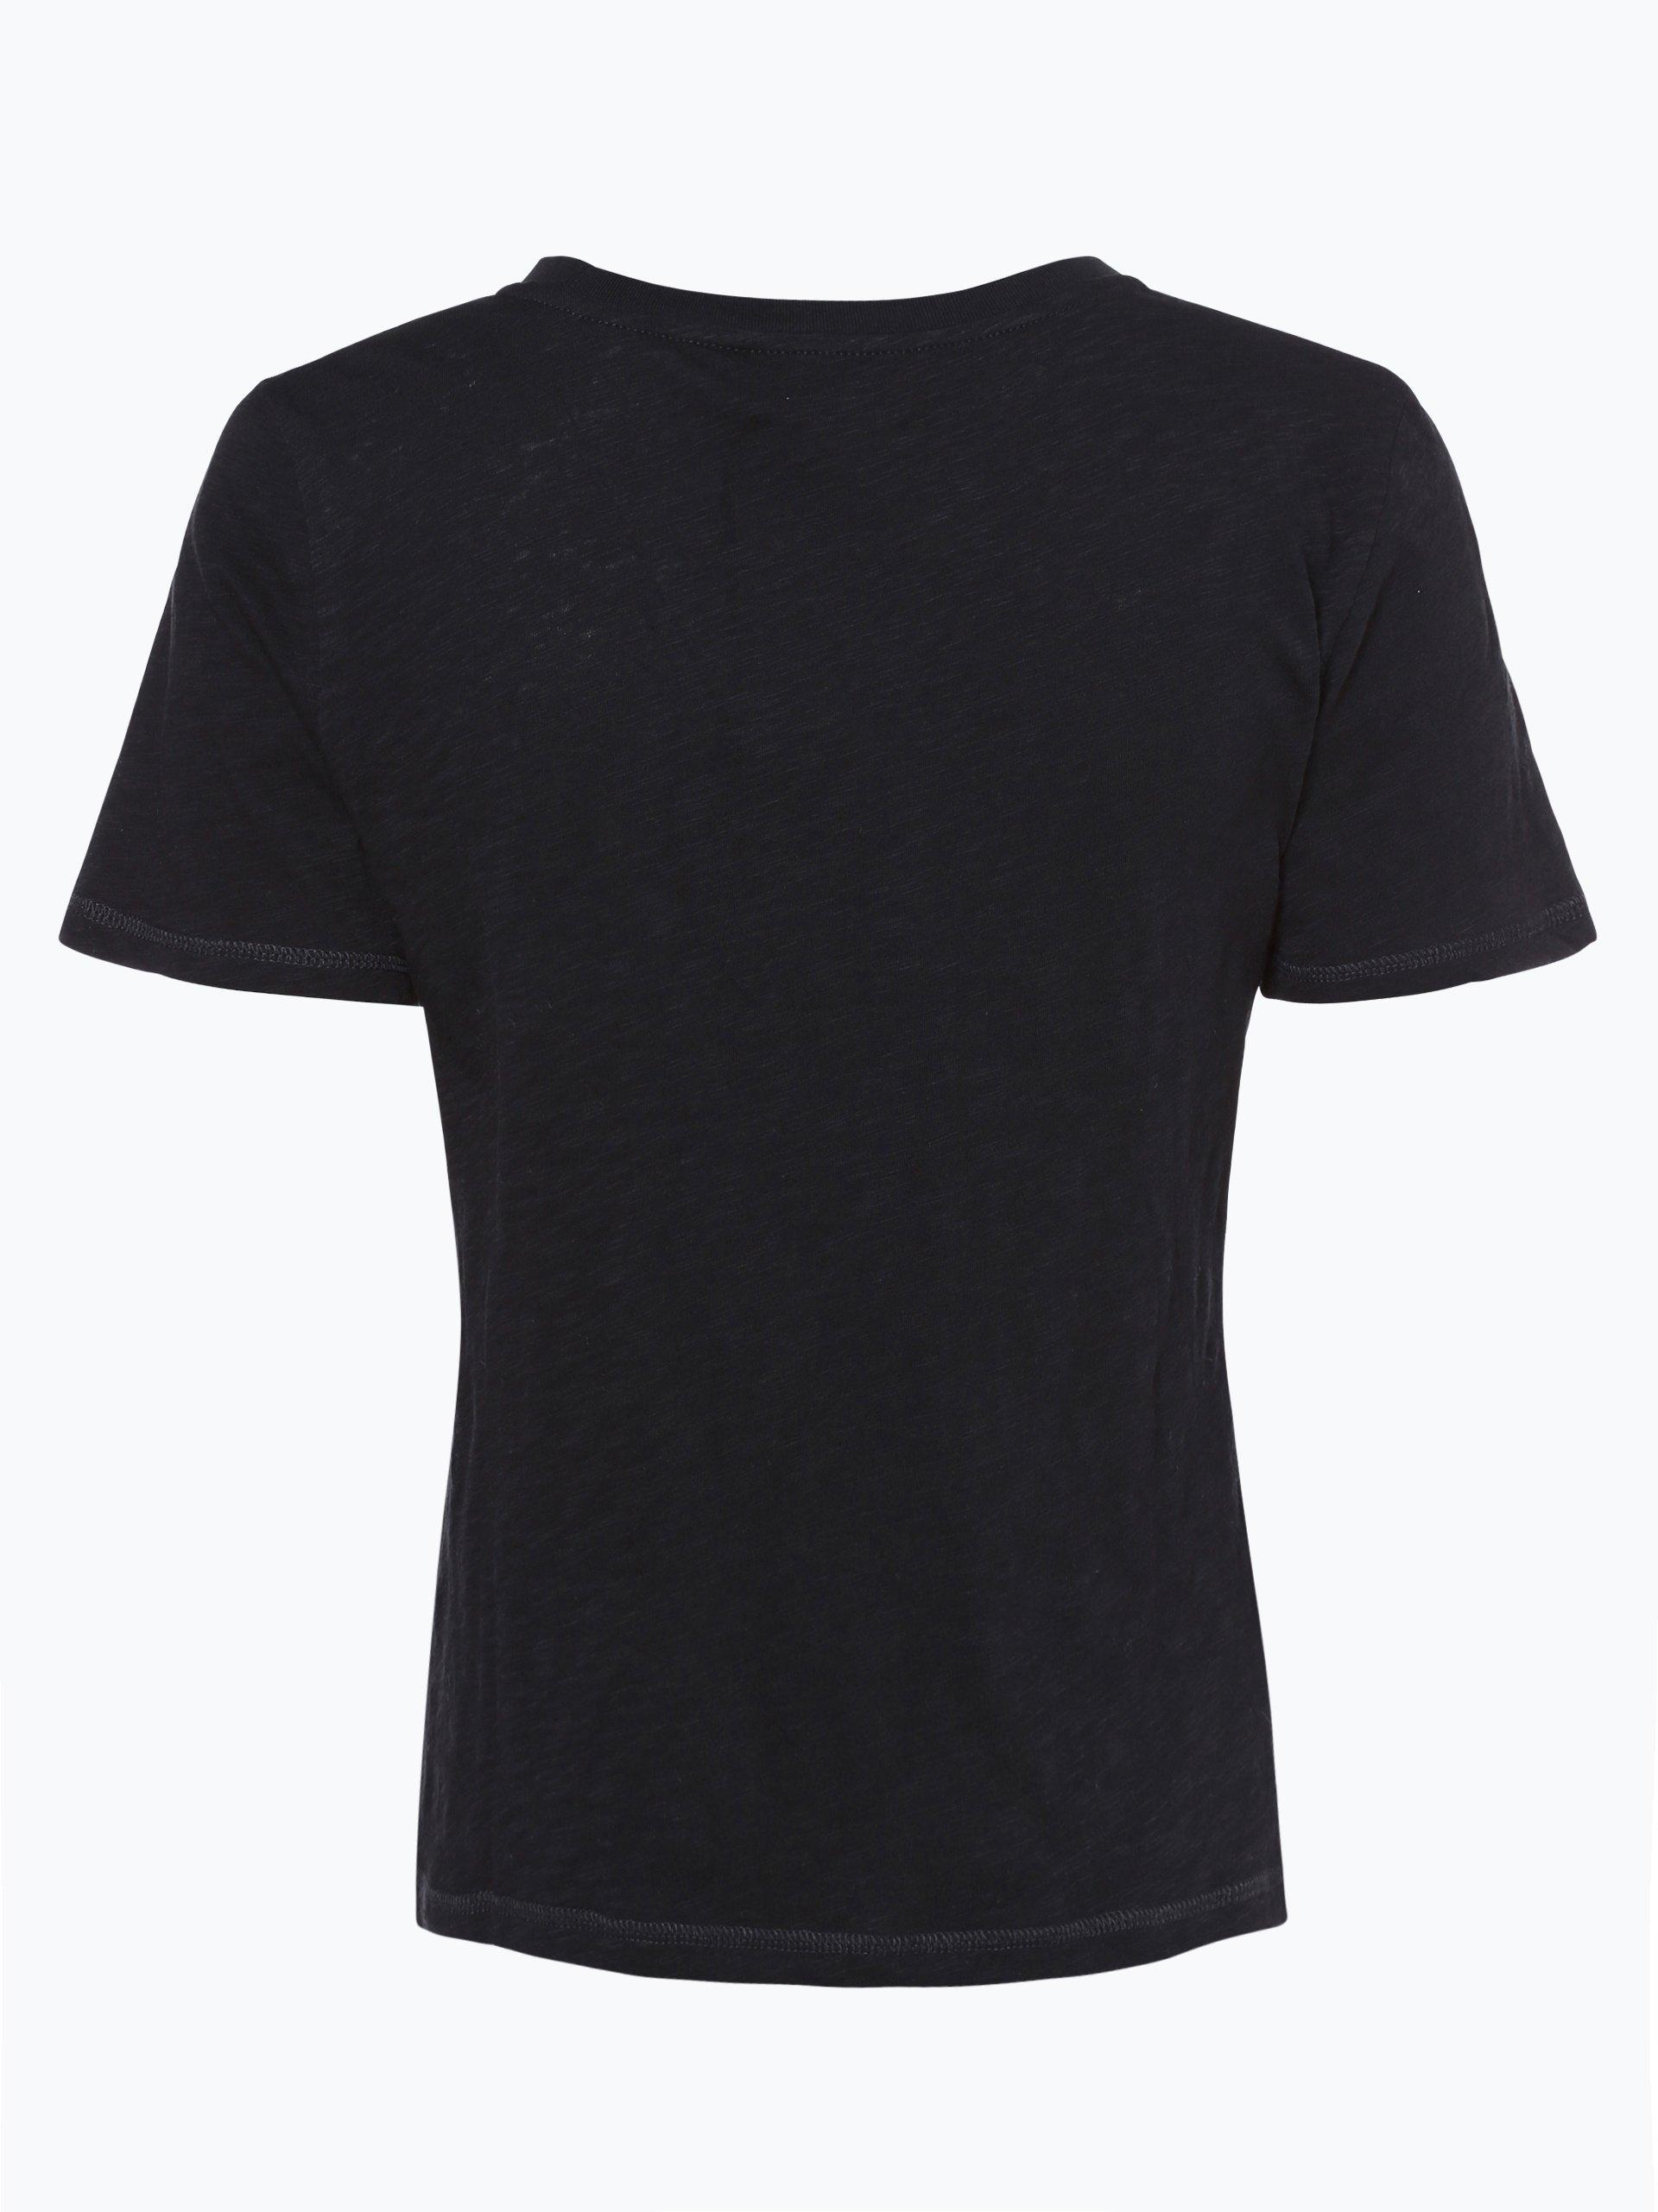 Pepe Jeans Damen T-Shirt - Mafalda